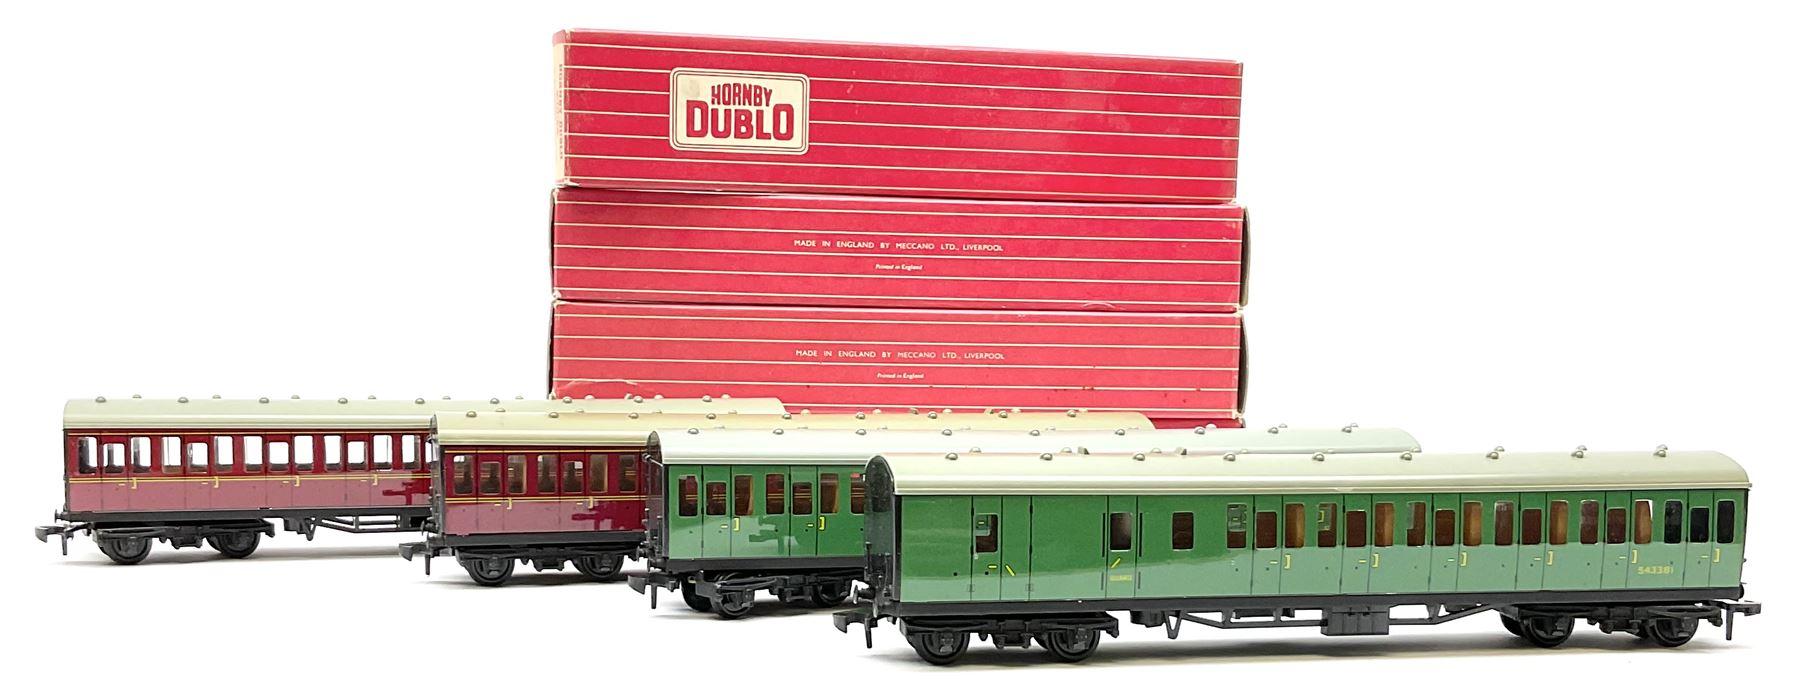 Hornby Dublo - four Suburban Coaches comprising 4081 2nd Class S.R.; 4082 Brake/2nd S.R.; 4083 1st/2